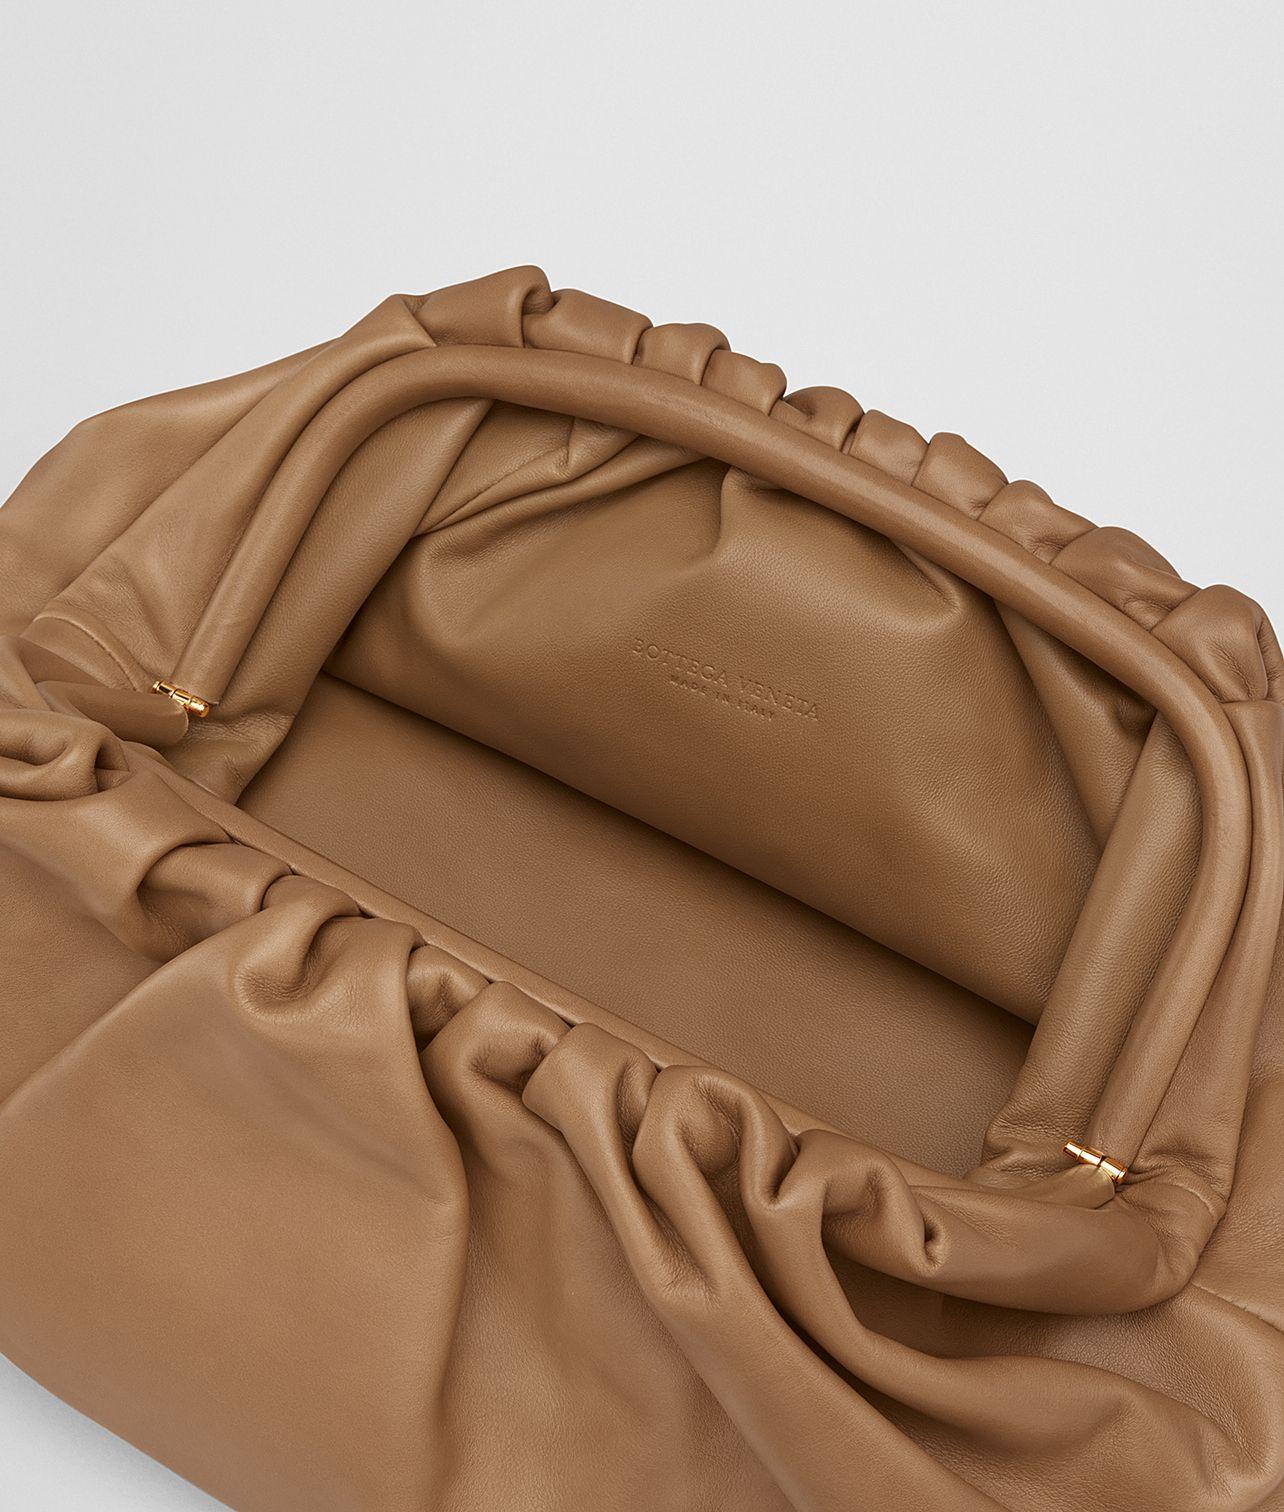 9c8123aa9b The pouch in butter calf in 2019 | leather | Bottega veneta, Bags ...